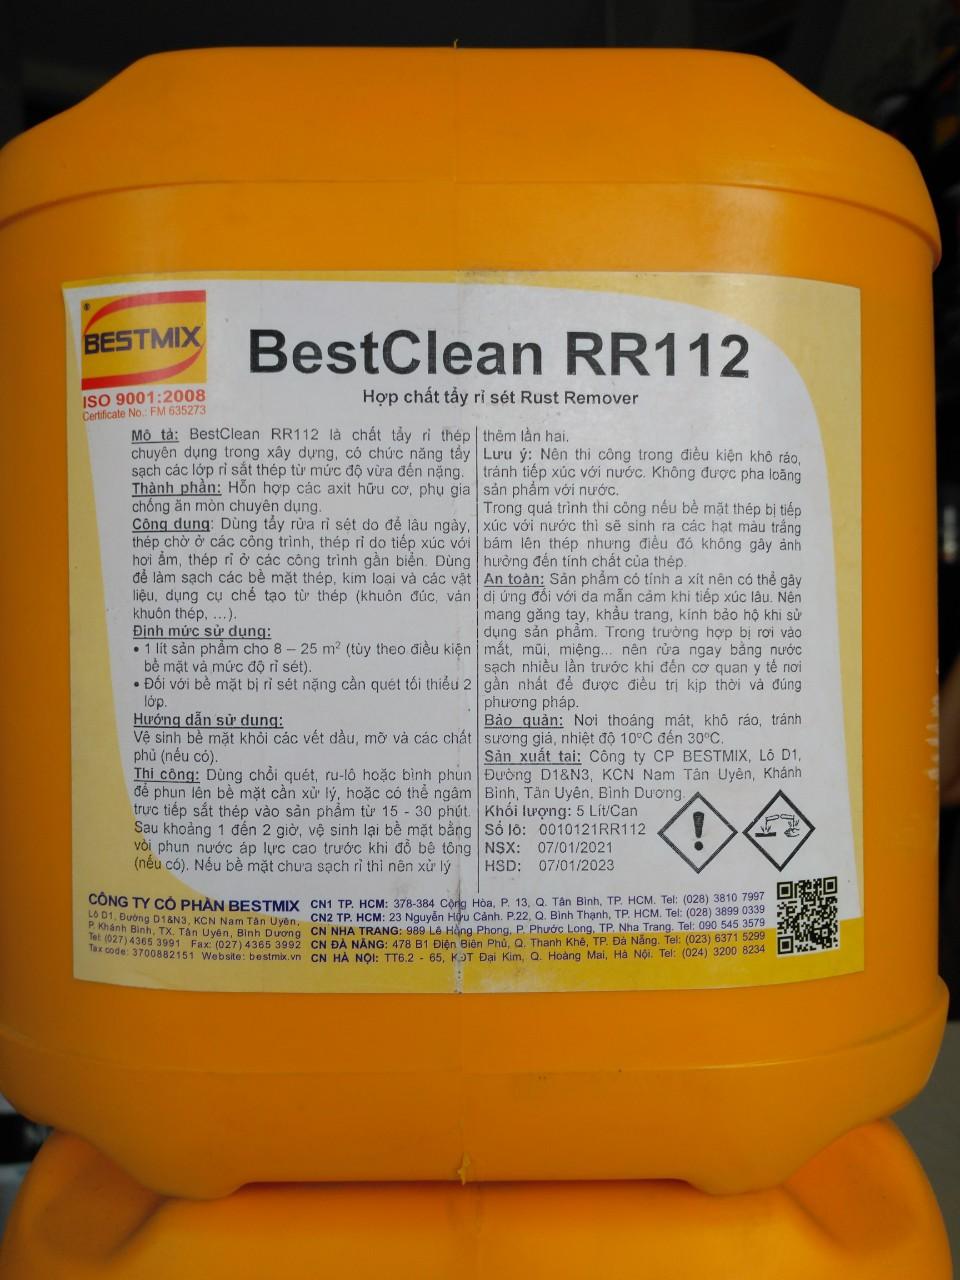 RR112